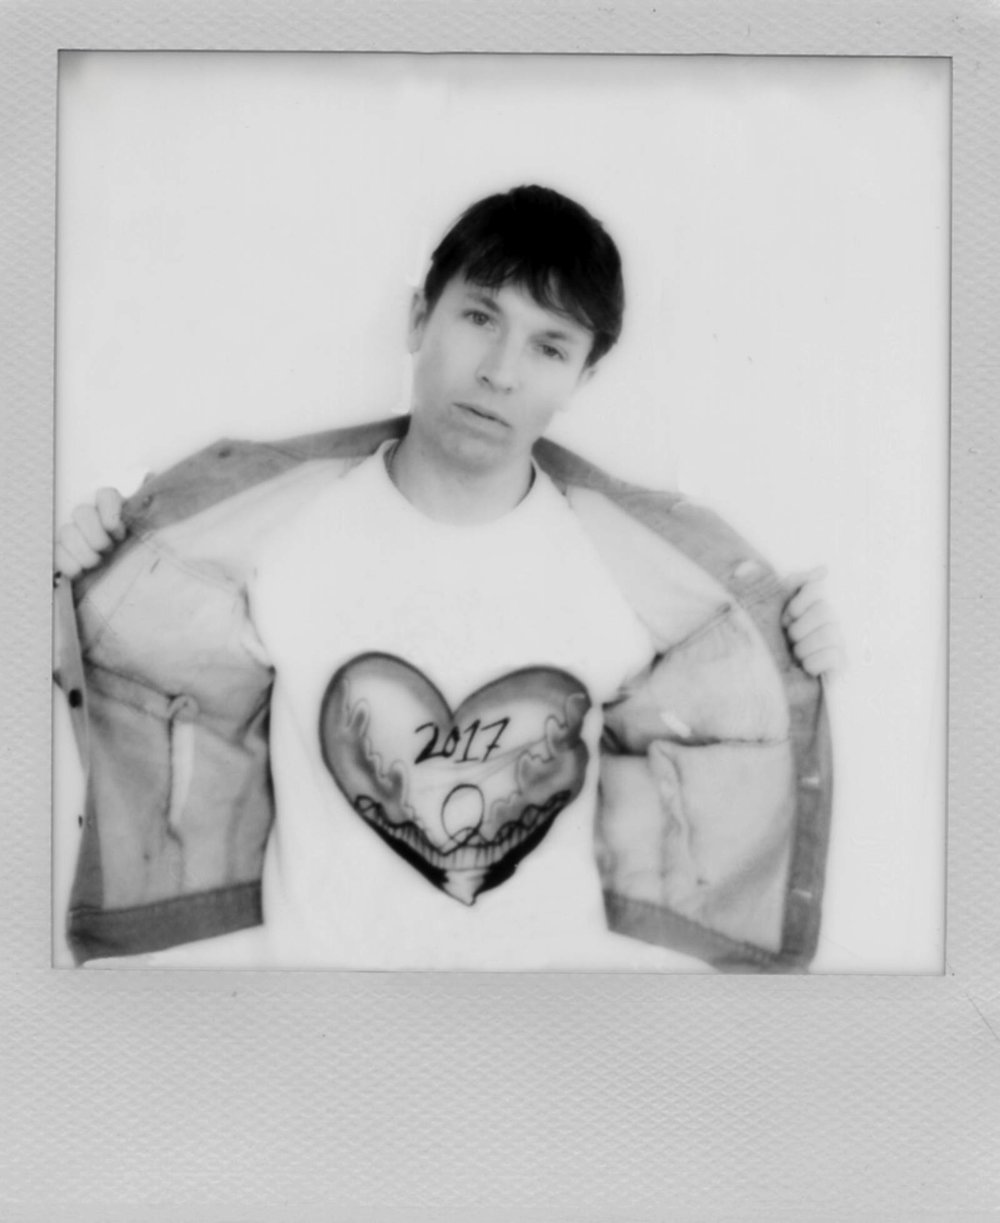 Return of the #PolaroidOriginals    By Gabriela Serpa